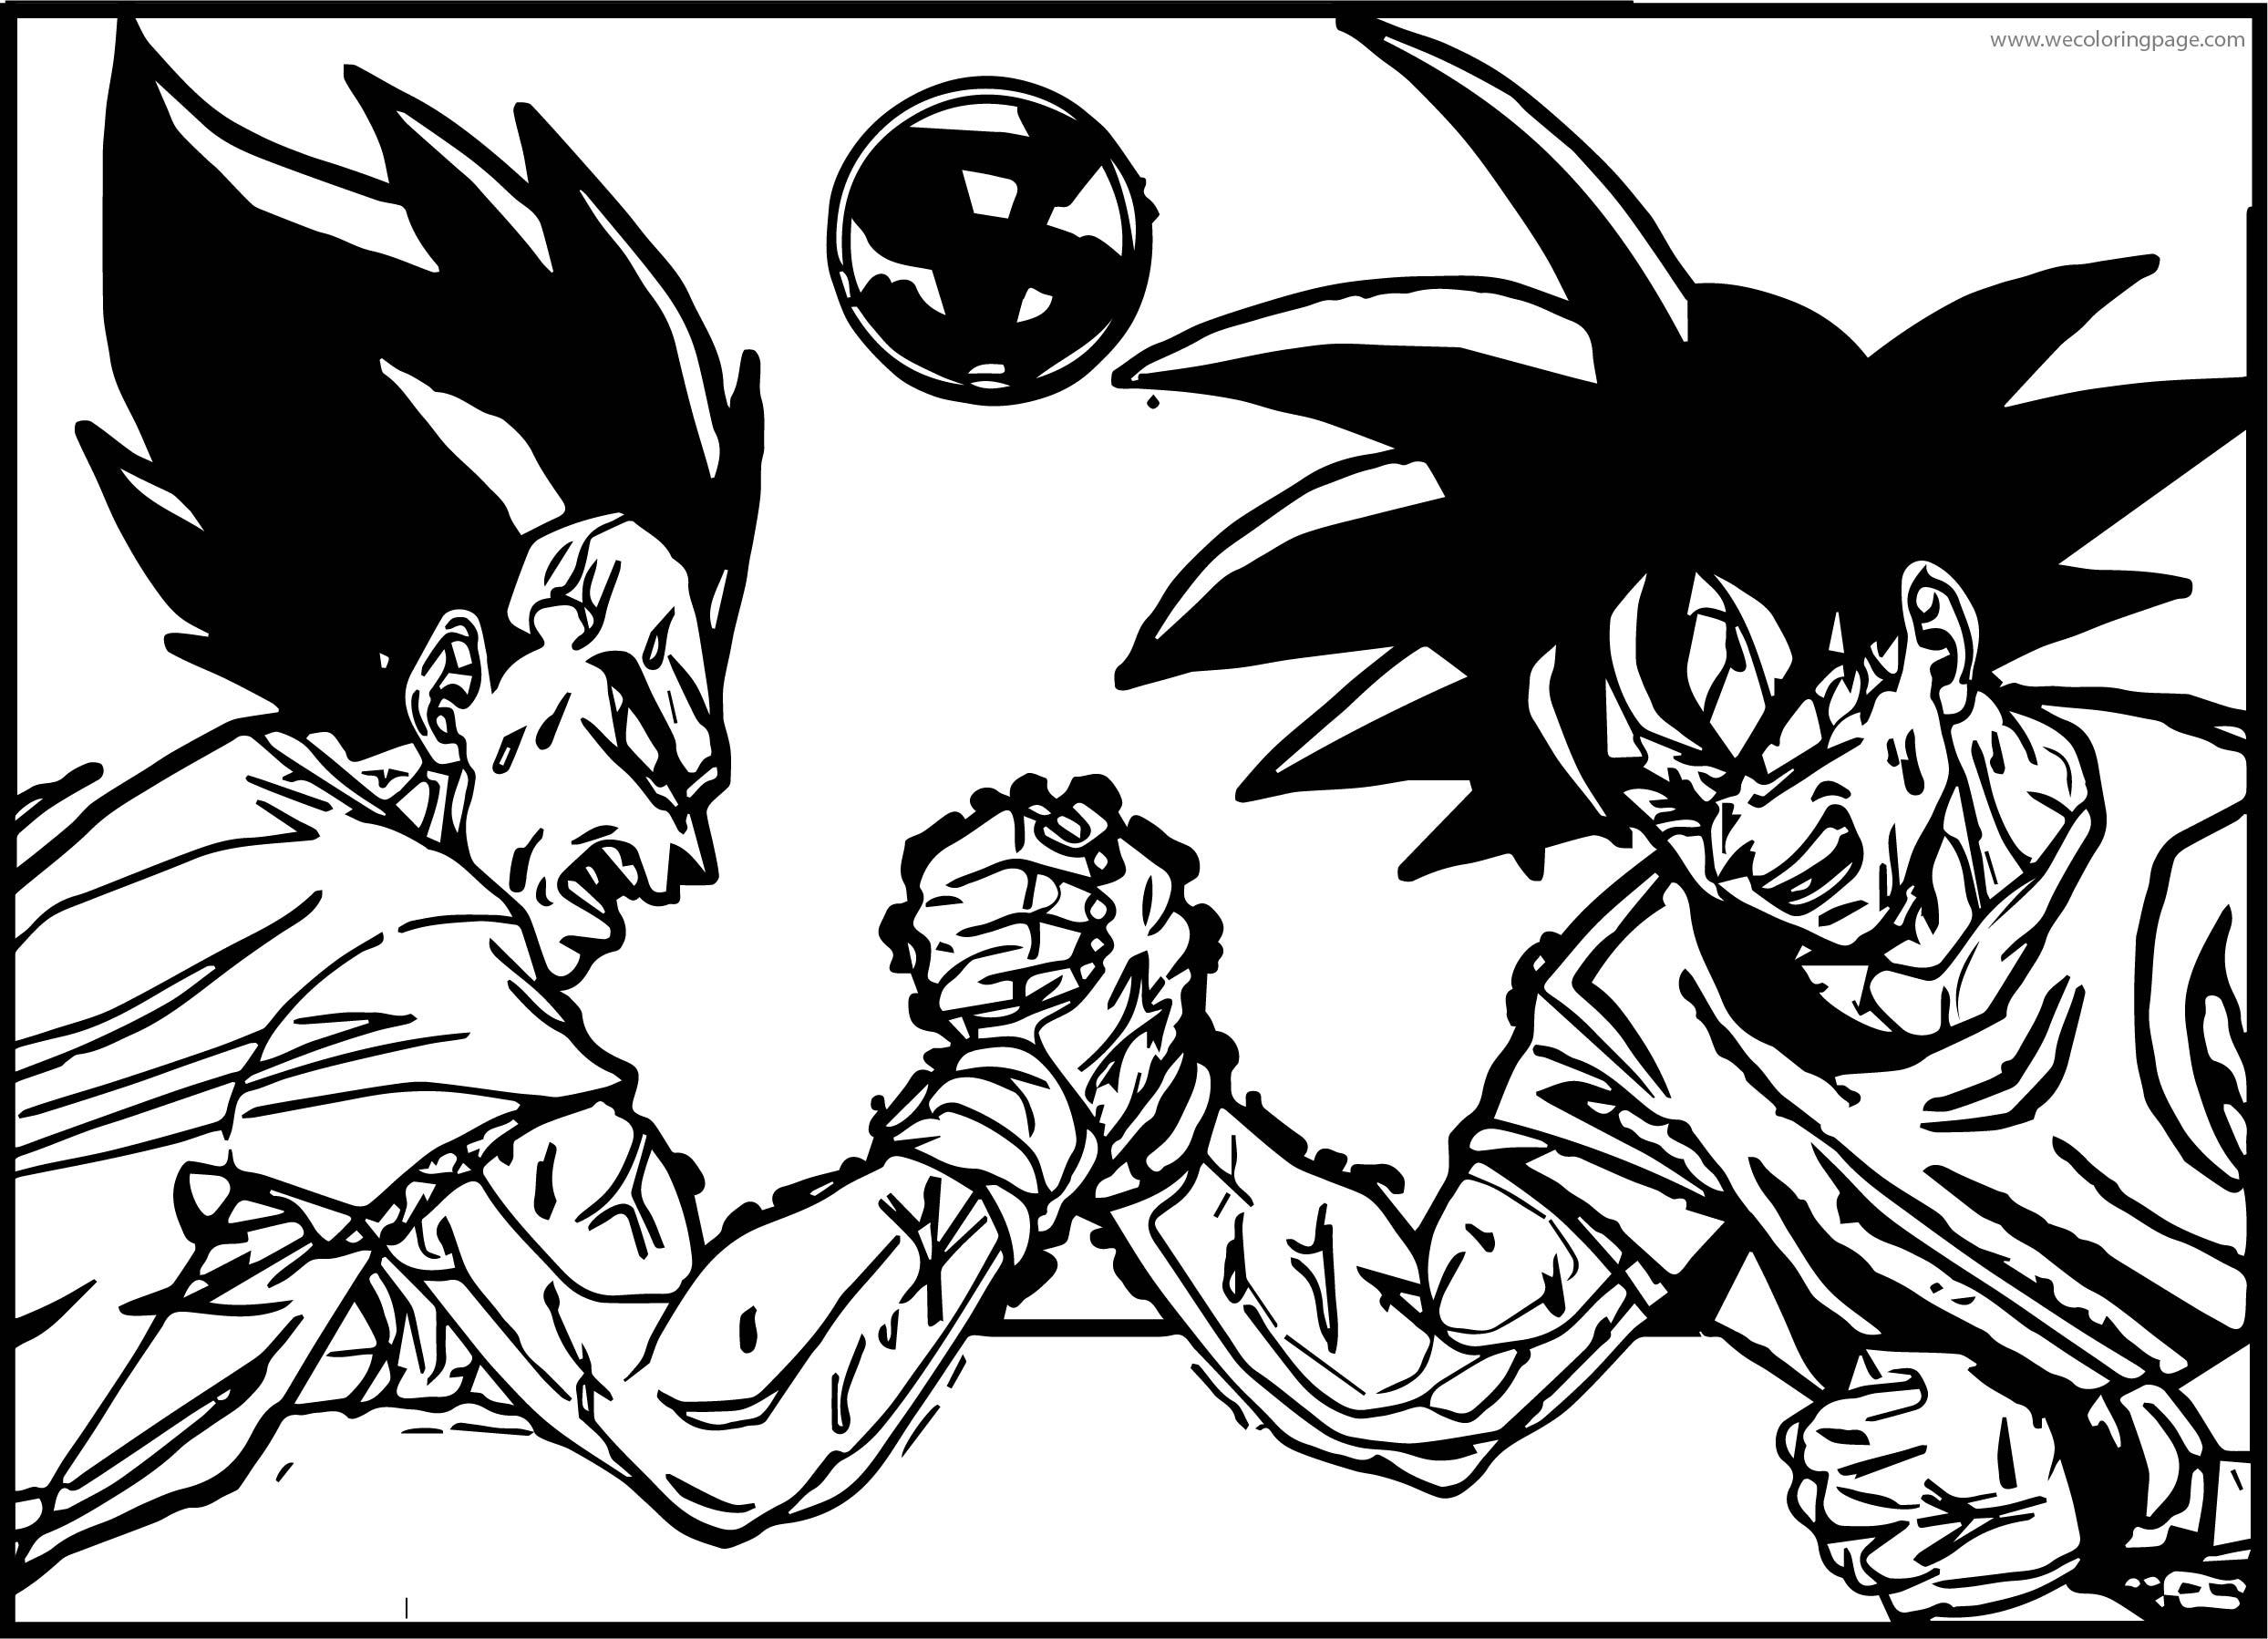 Goku We Coloring Page 461